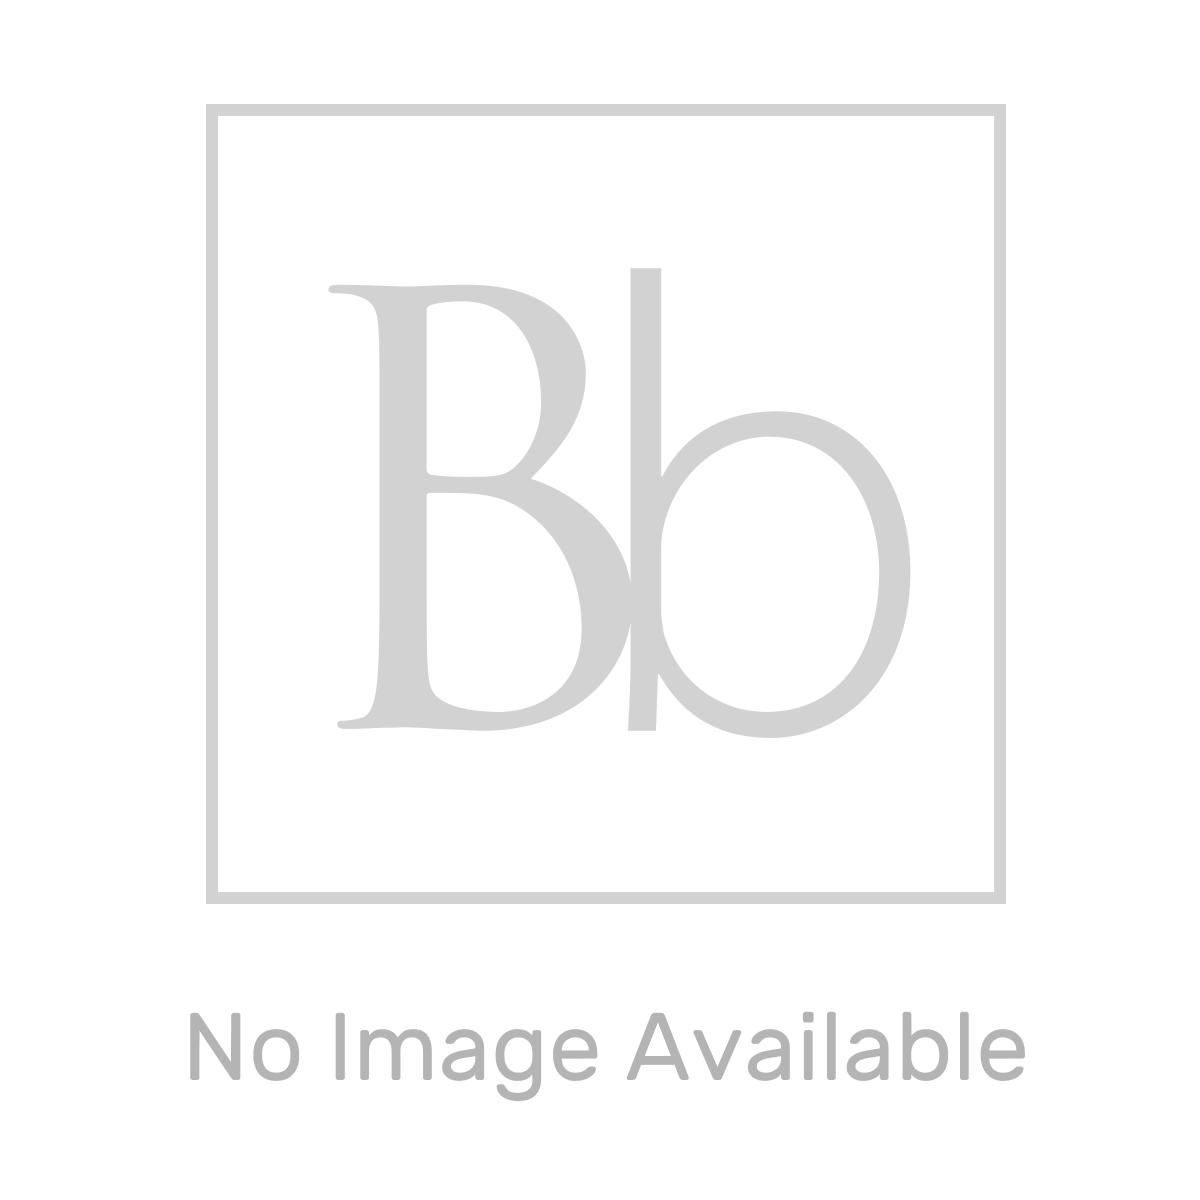 Elation Ikoma Pearl Grey Matt Mirror 550mm Dimensions